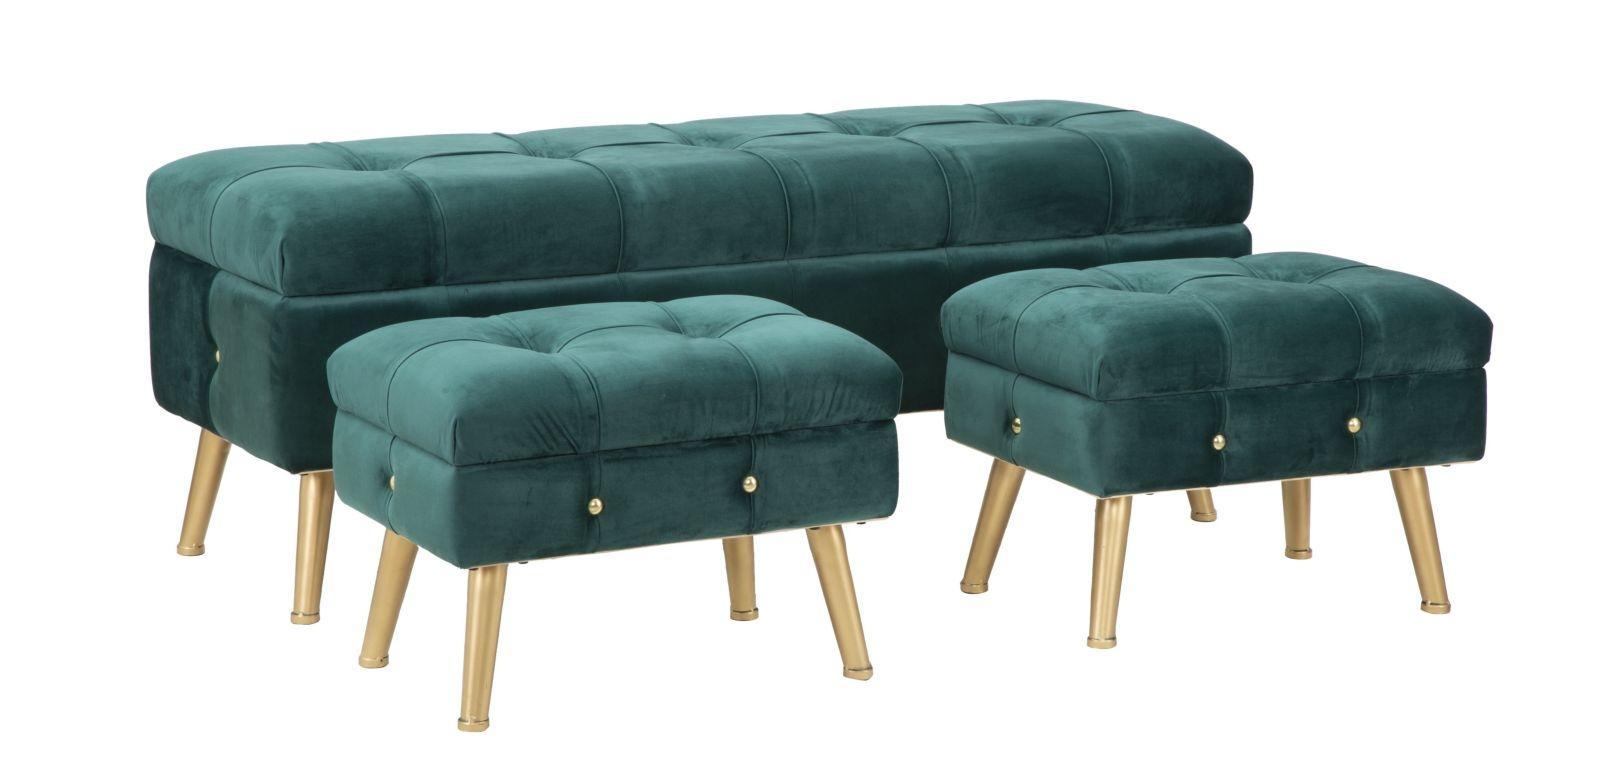 Set banca cu 2 taburete, tapitate cu stofa si picioare metalice Glam Verde, l124xA42xH47,5 cm / l50xA34xH37 cm din categoria Taburete si Banci